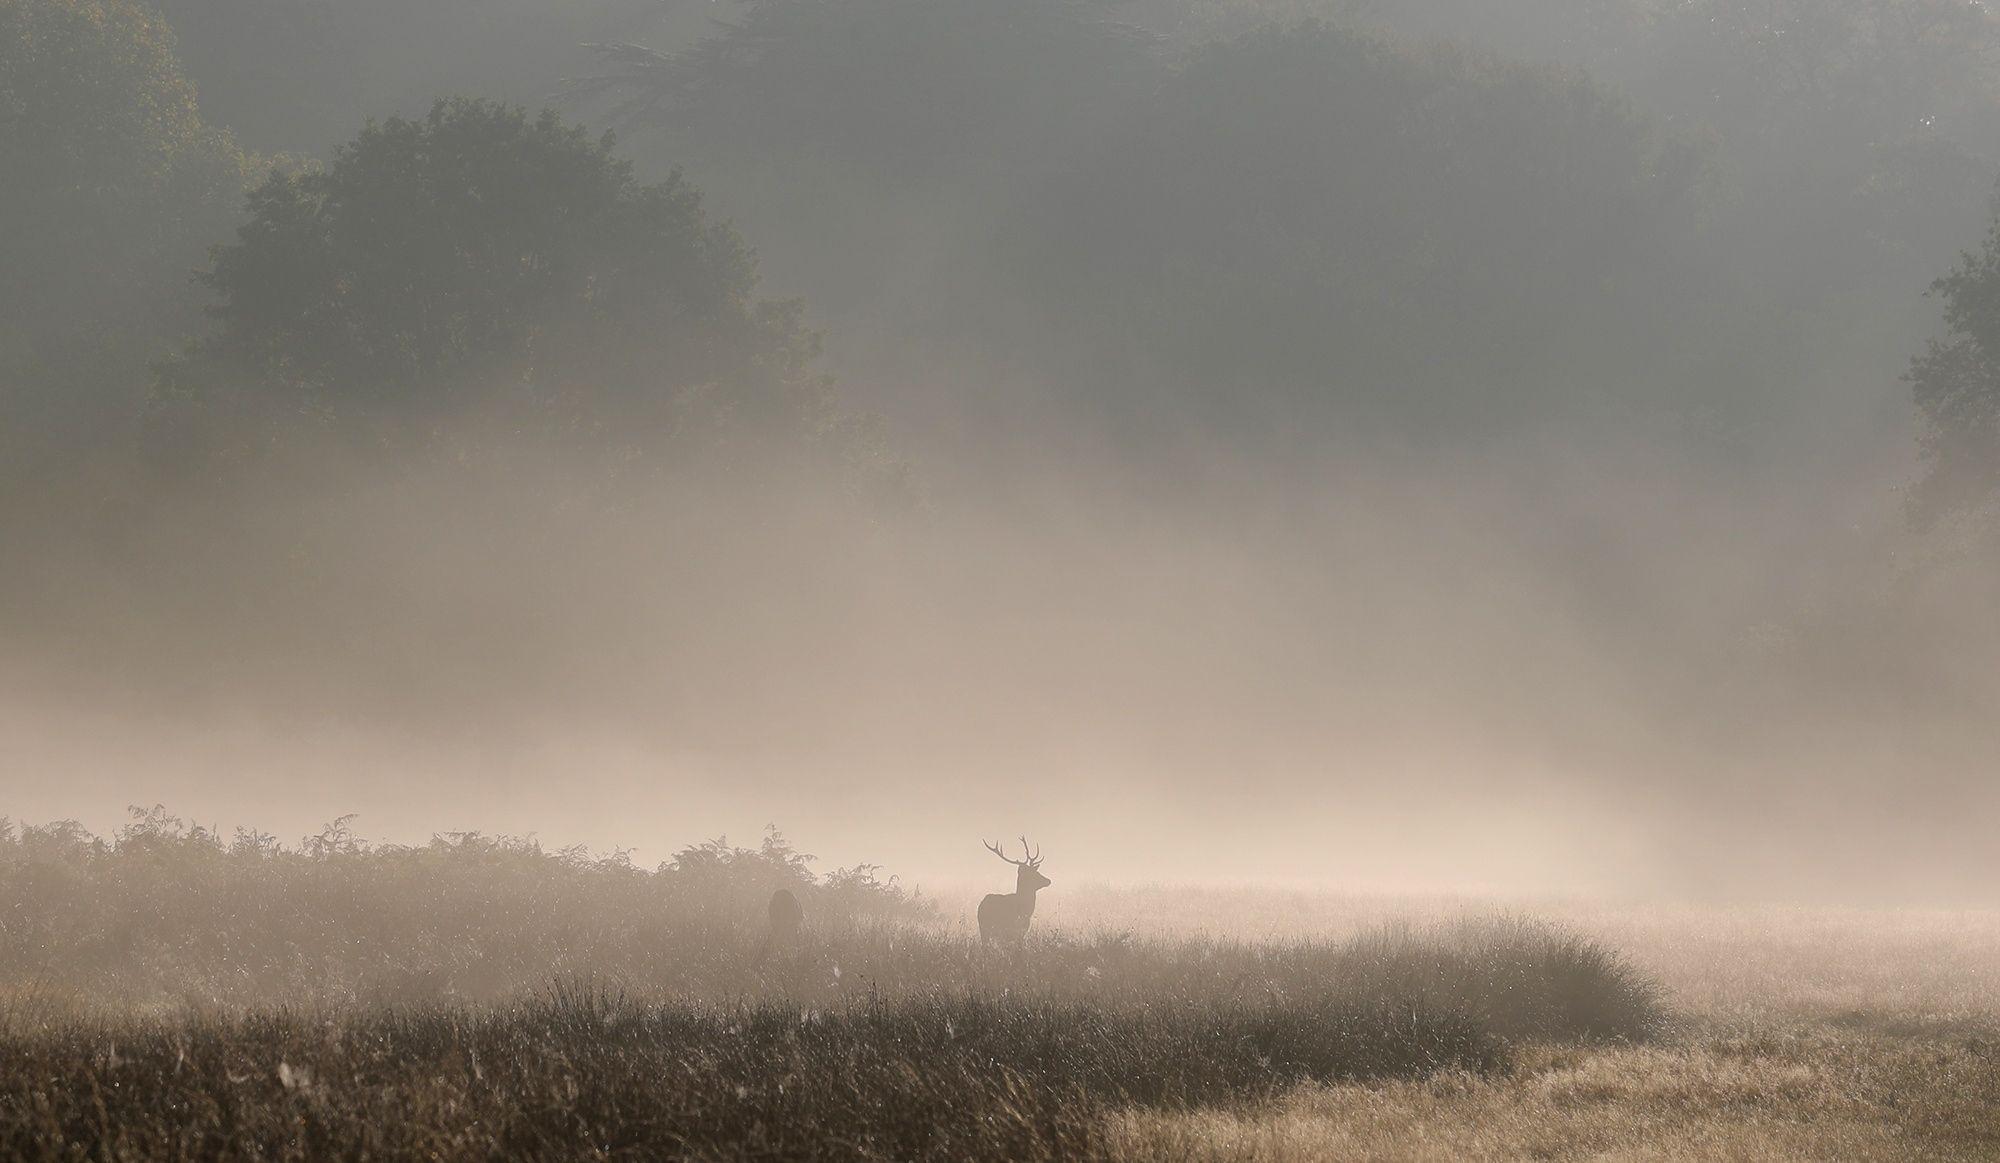 Red deer in Richmond Park. - Red deer in mist in Richmond Park.